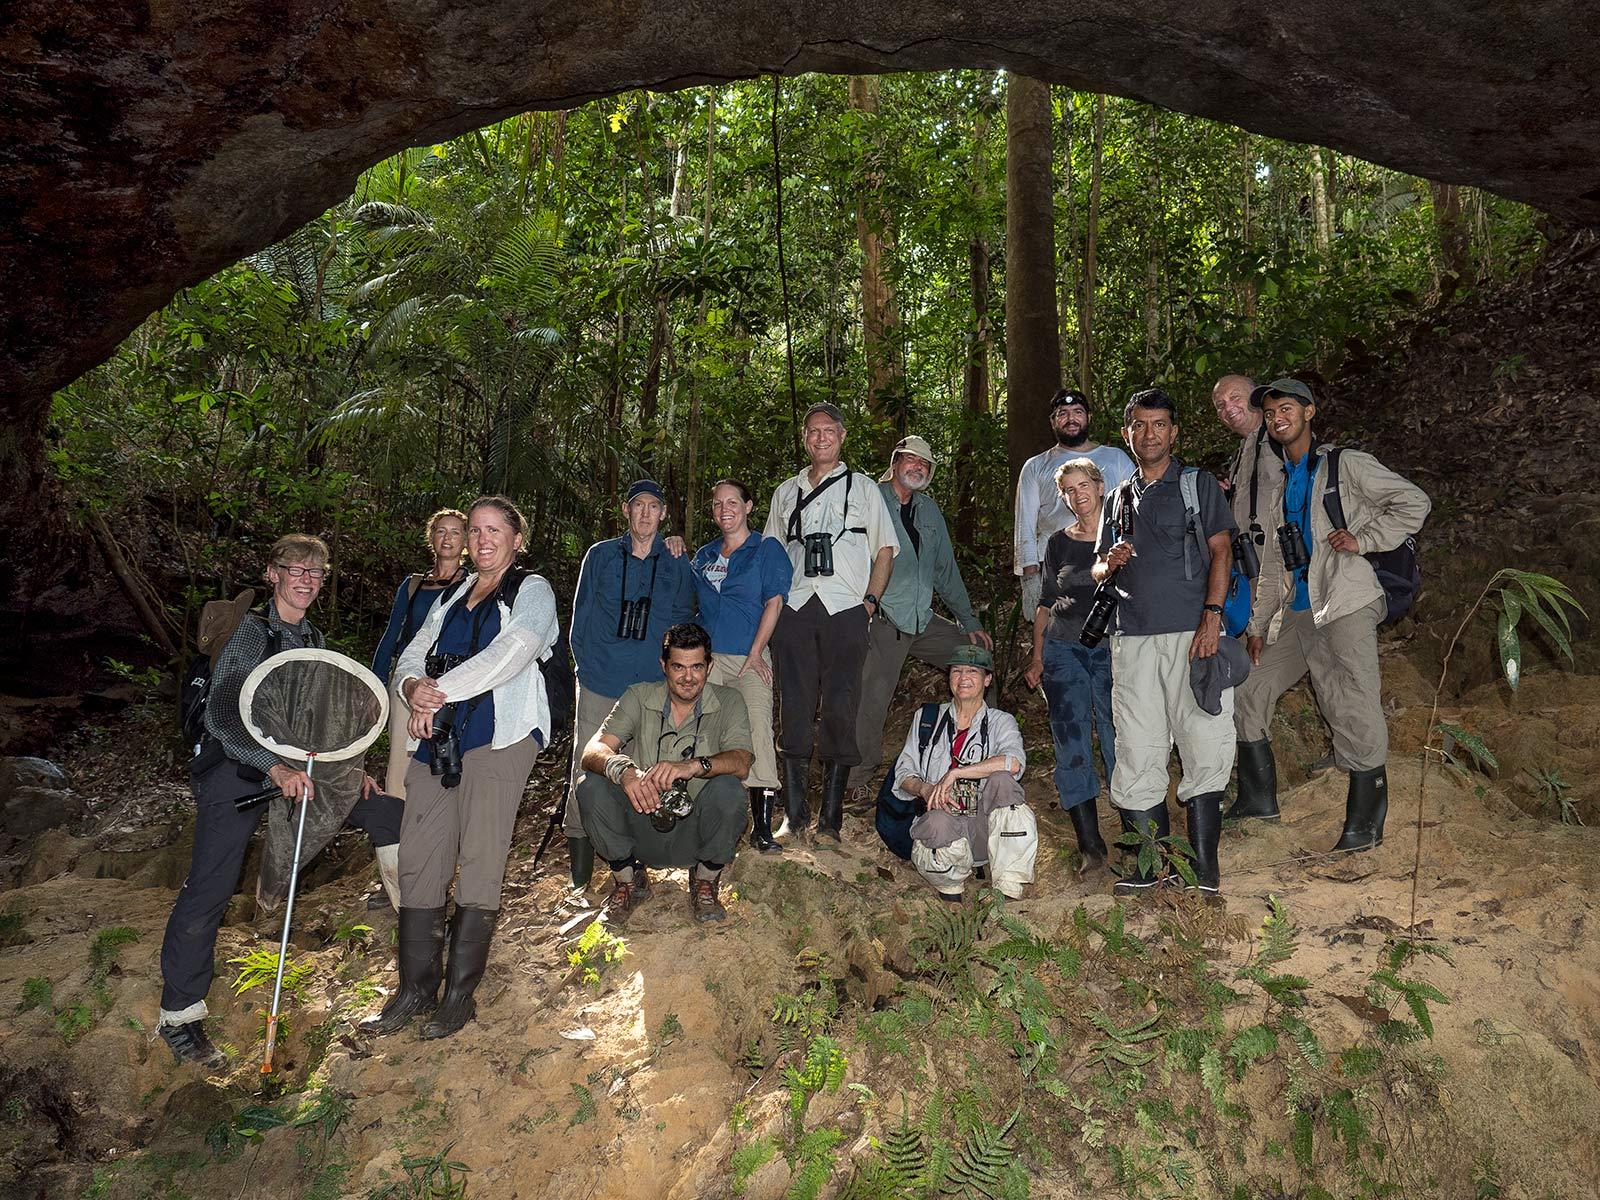 The Dorinha Amazon expedition team